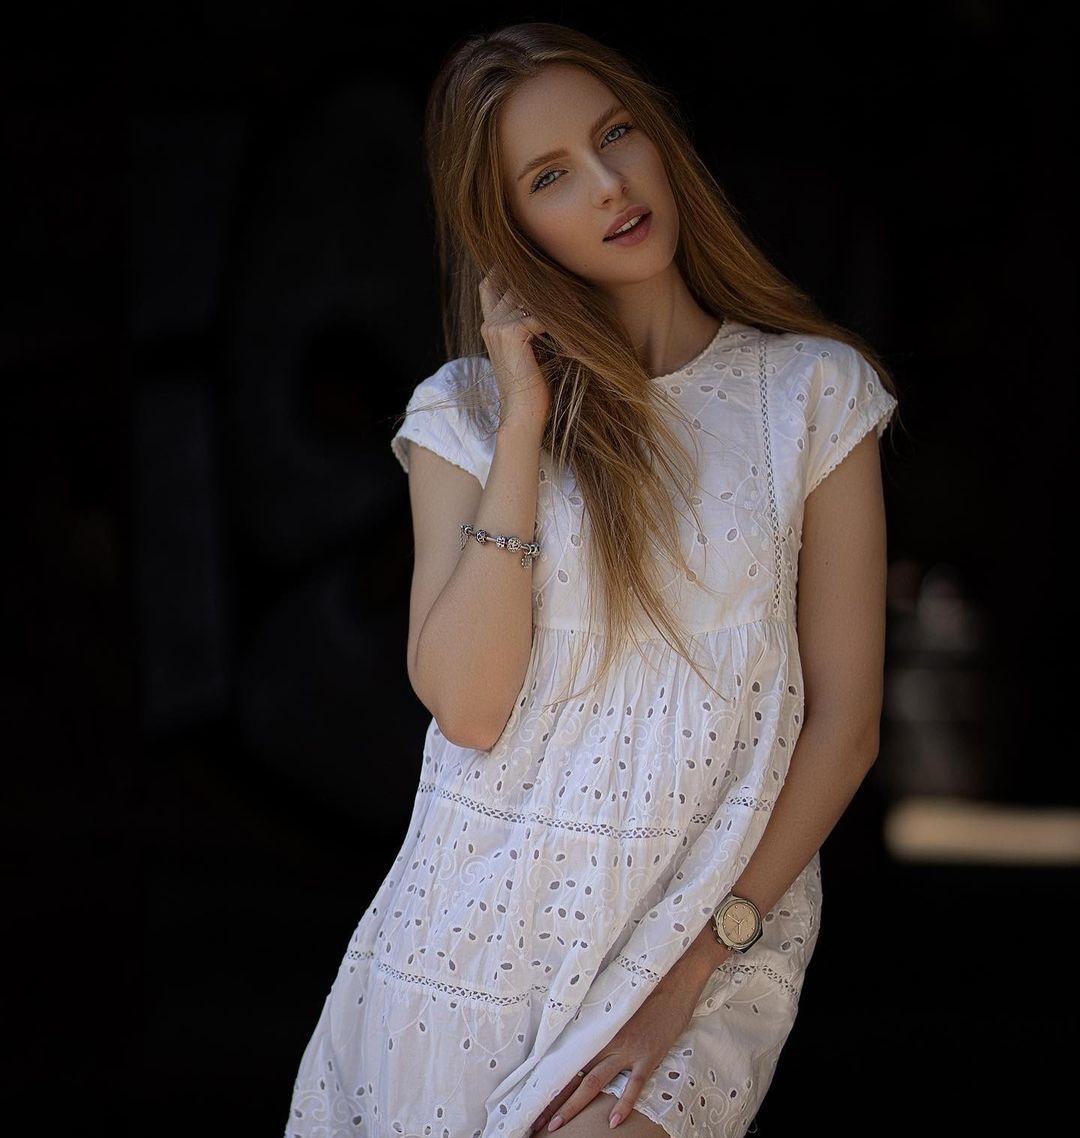 Nicole-marie-j-Wallpapers-Insta-Fit-Bio-2